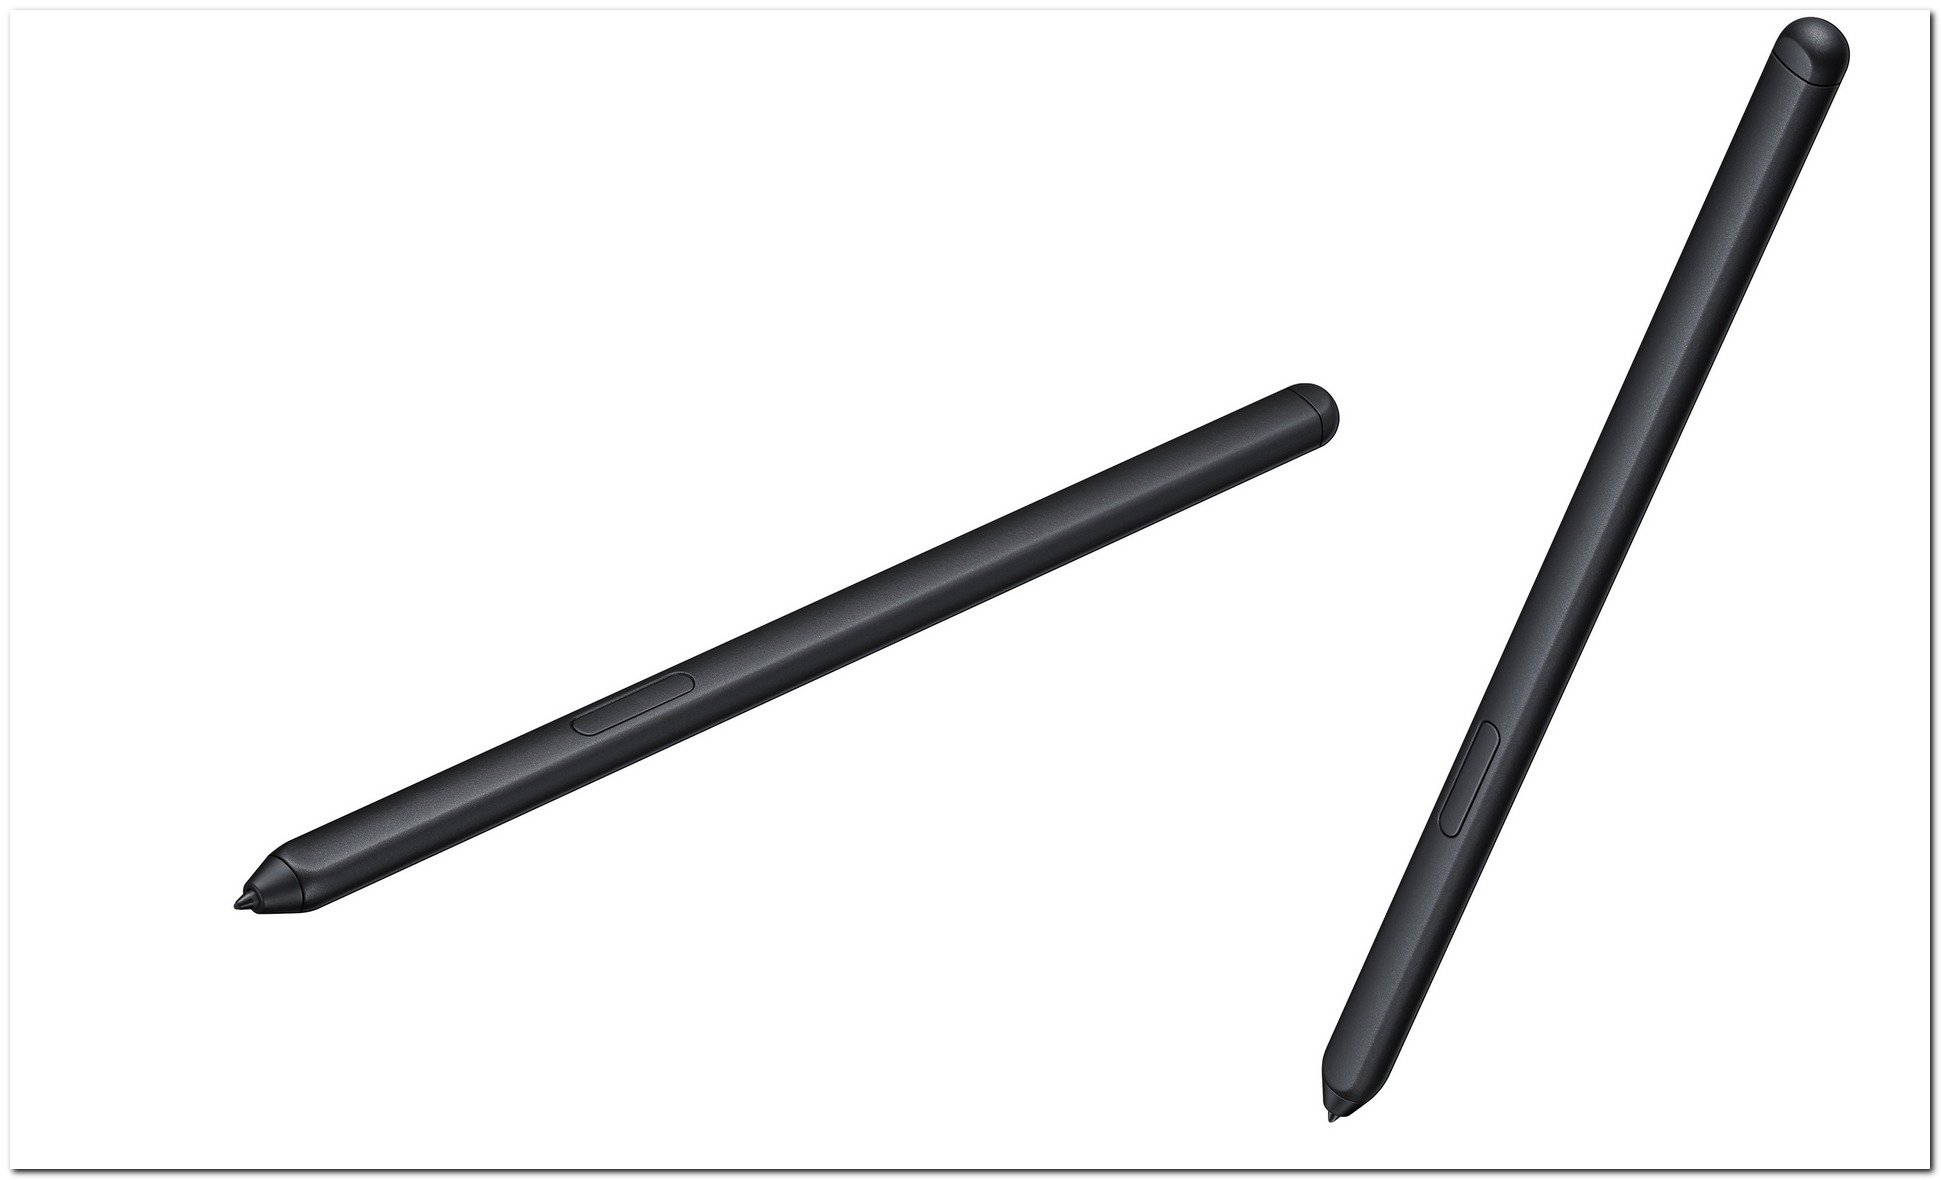 galaxy s21 ultra s pen